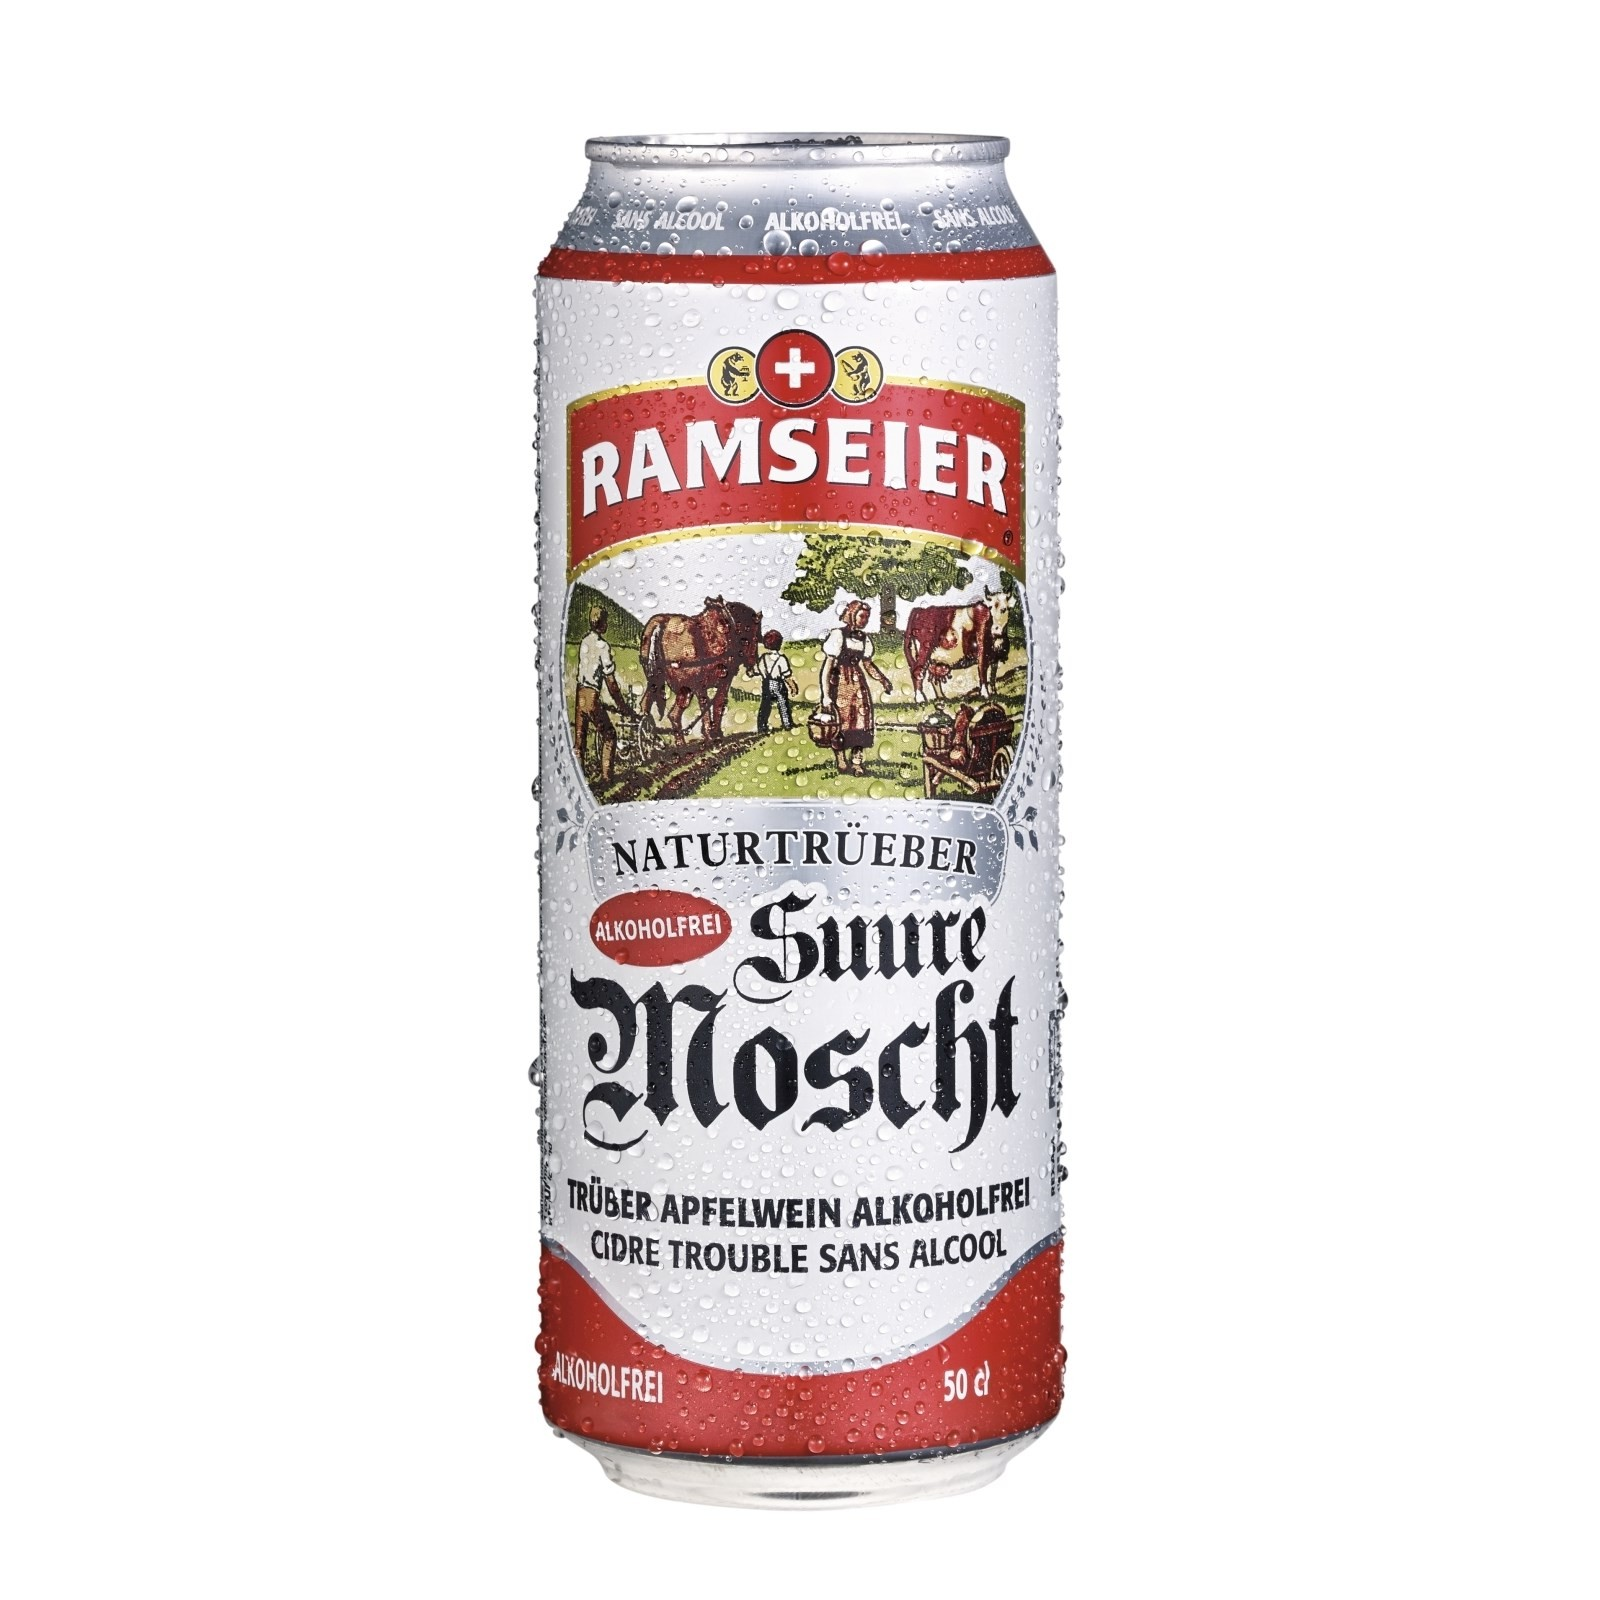 Ramseier – Apple Cider 'Suure Moscht naturtrüeb' Non-Alcoholic (6 x 0.5 l)